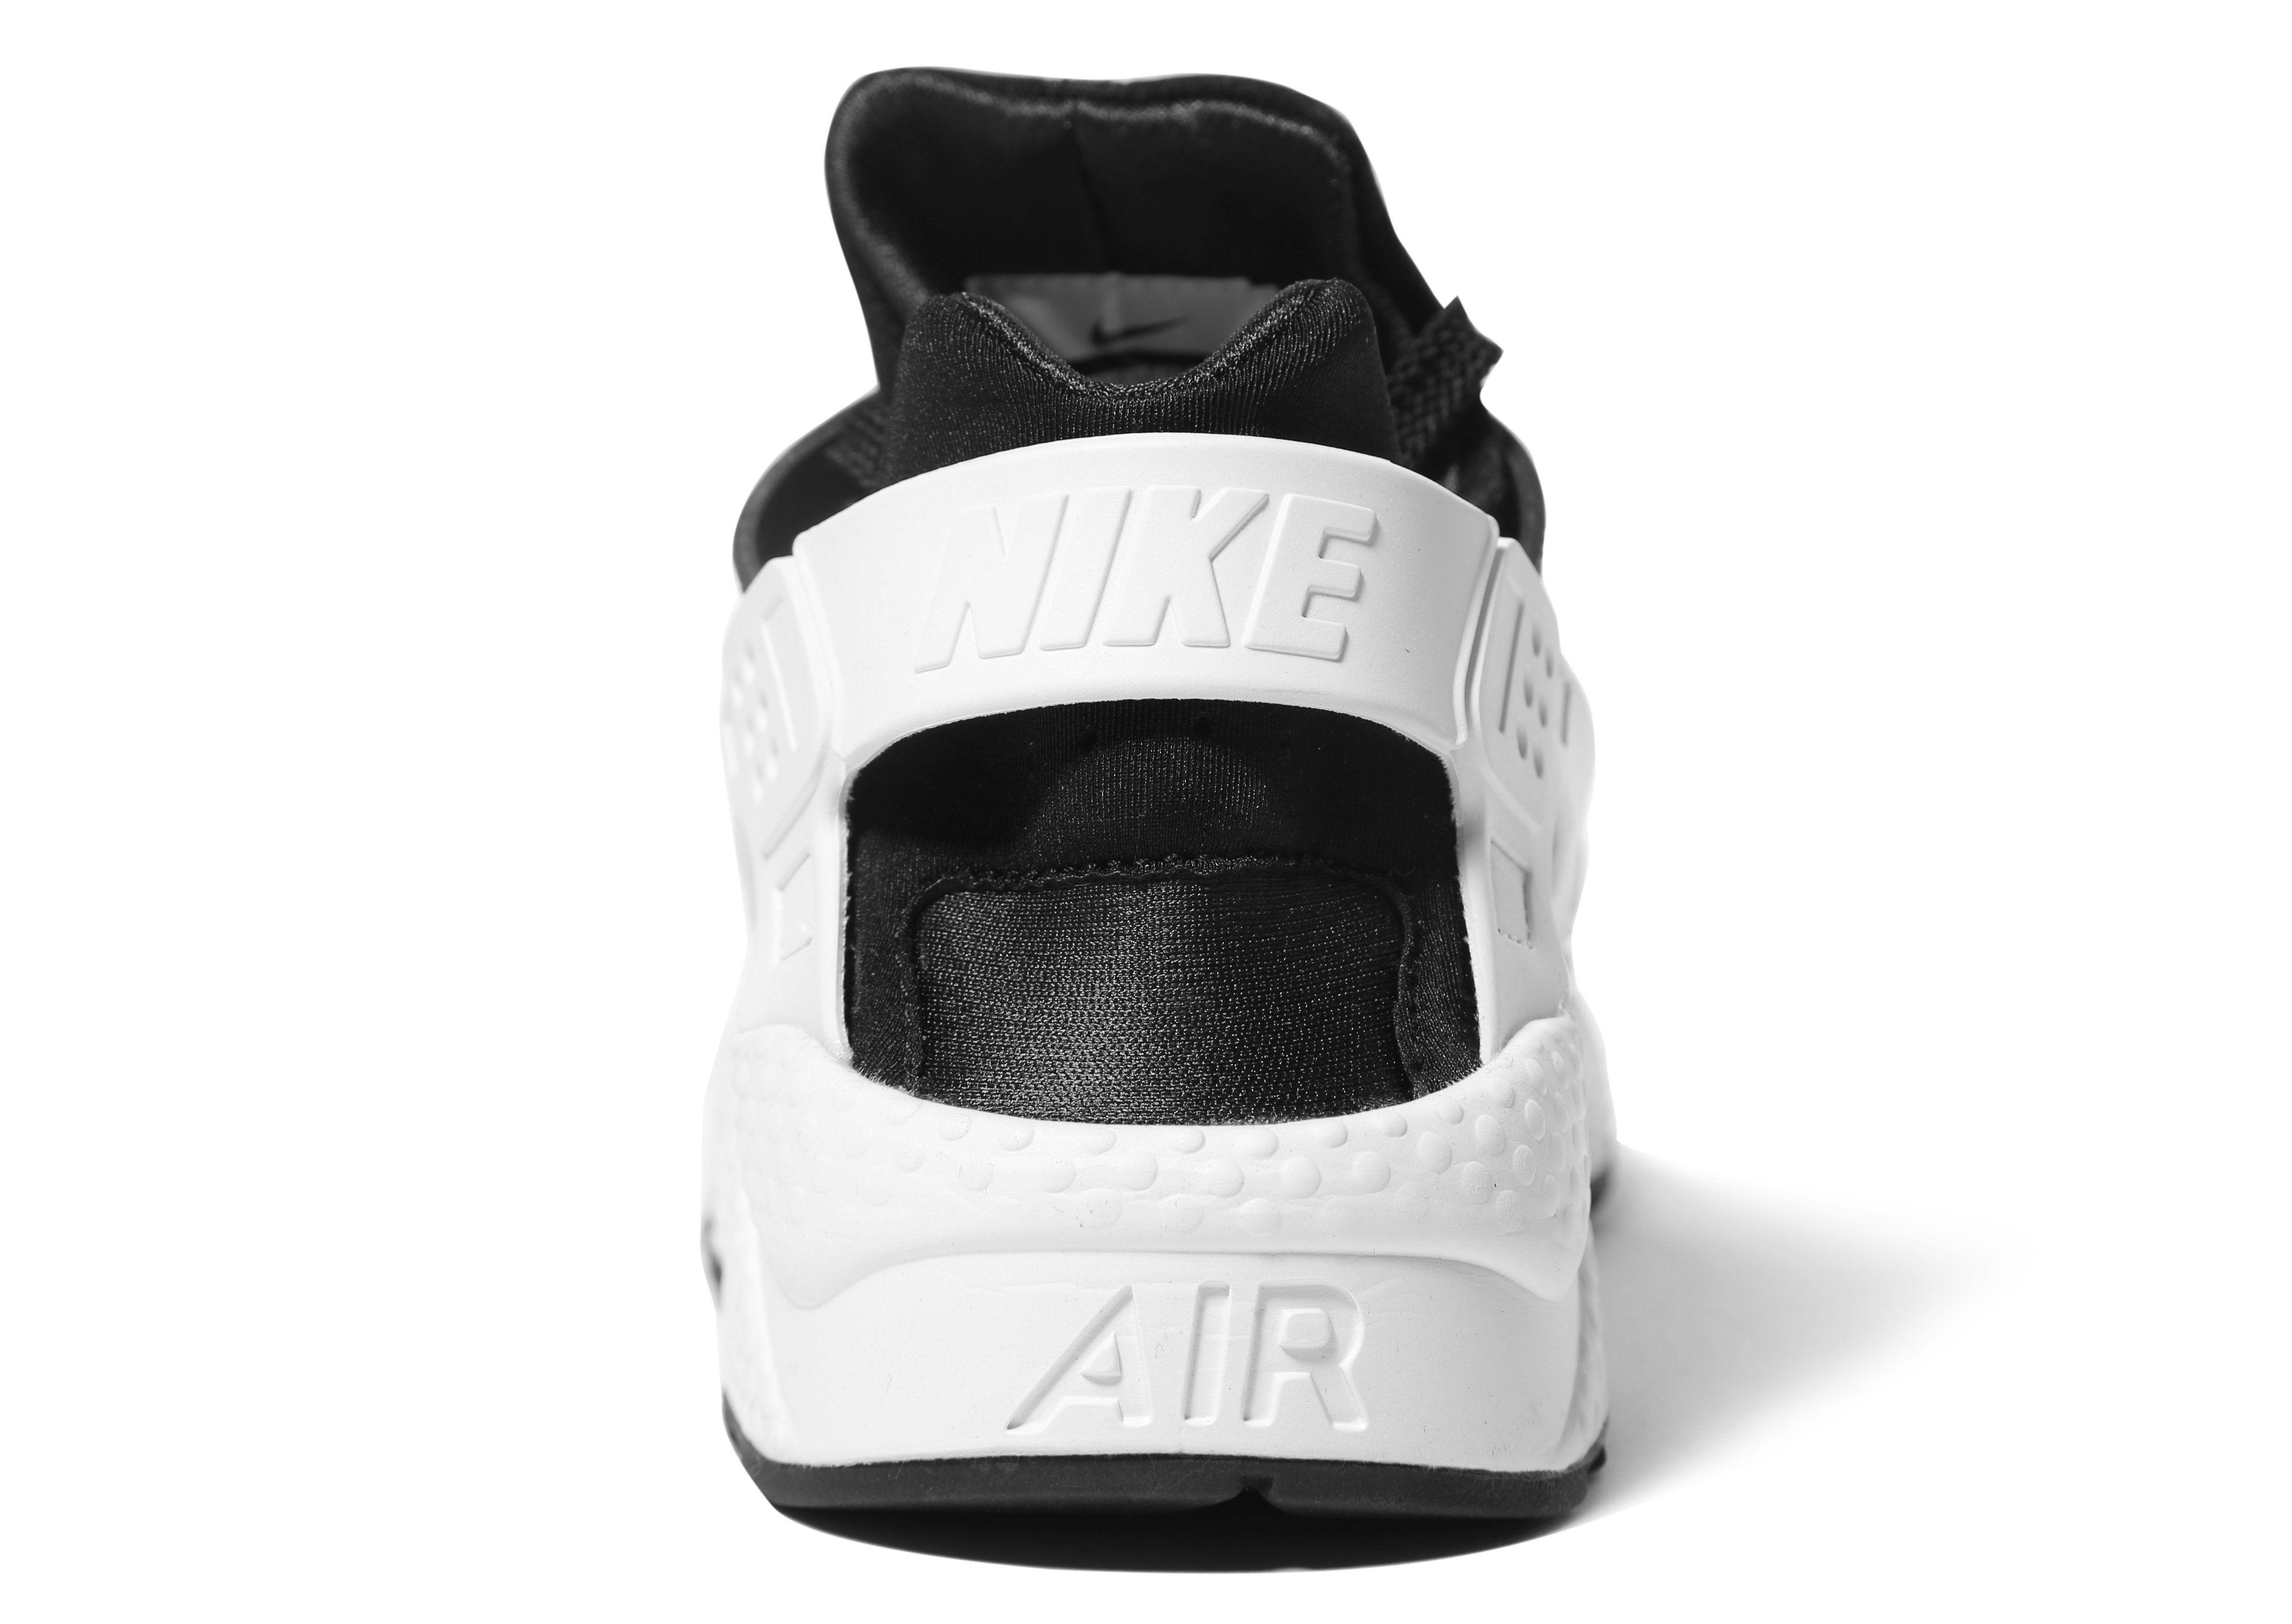 Verkauf Extrem Beeile Dich Nike Air Huarache Schwarz eS8jdGrlu